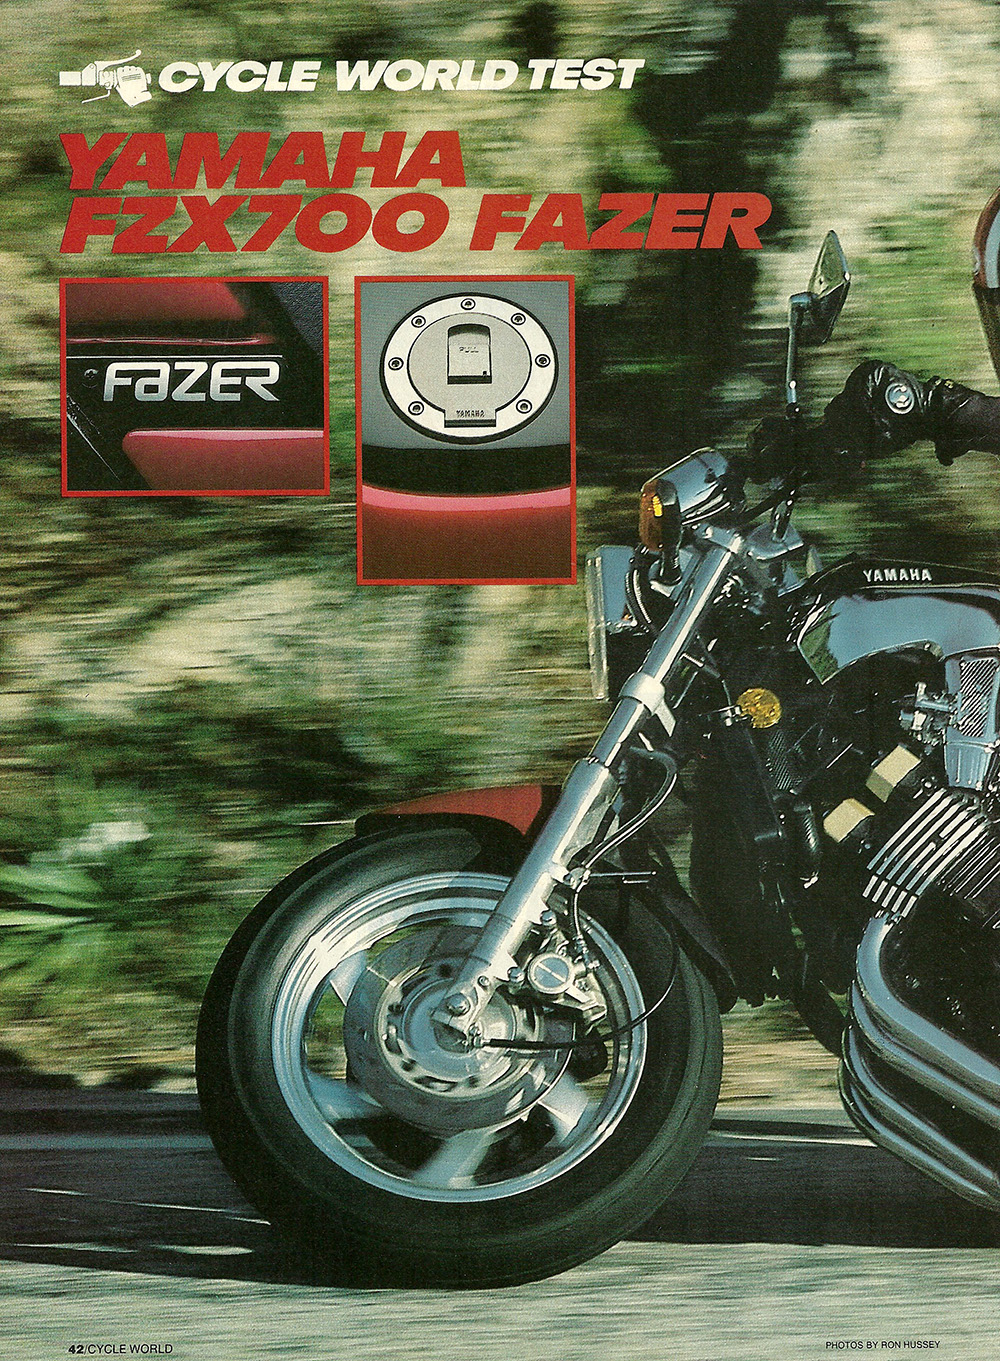 1986 Yamaha Fazer FZX700 road test 01.jpg